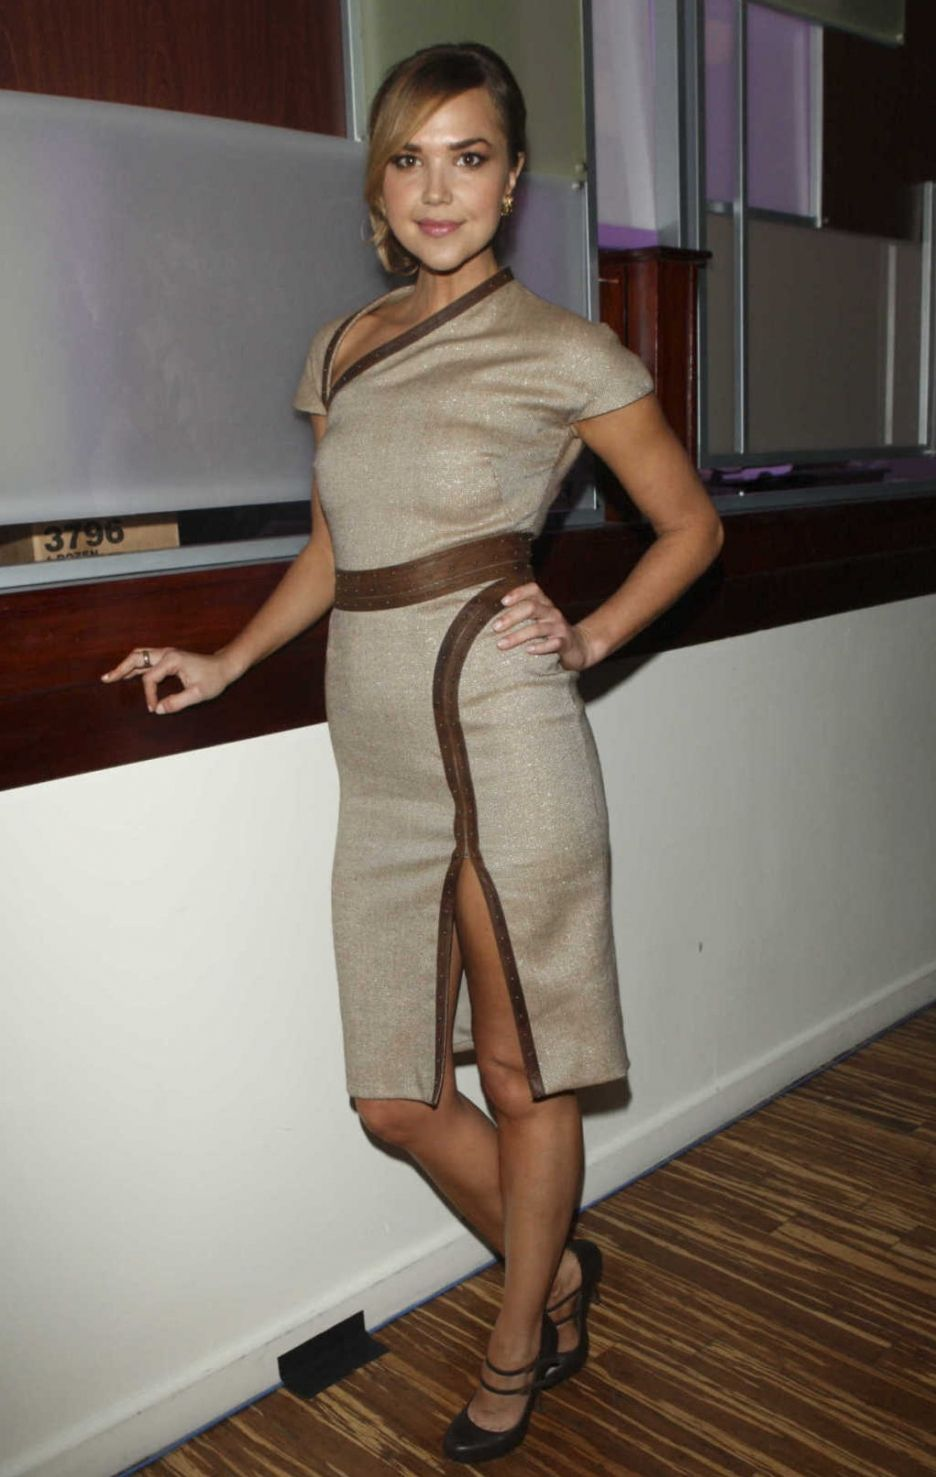 Arielle Kebbel Bra Size and Body Measurements | Arielle ...